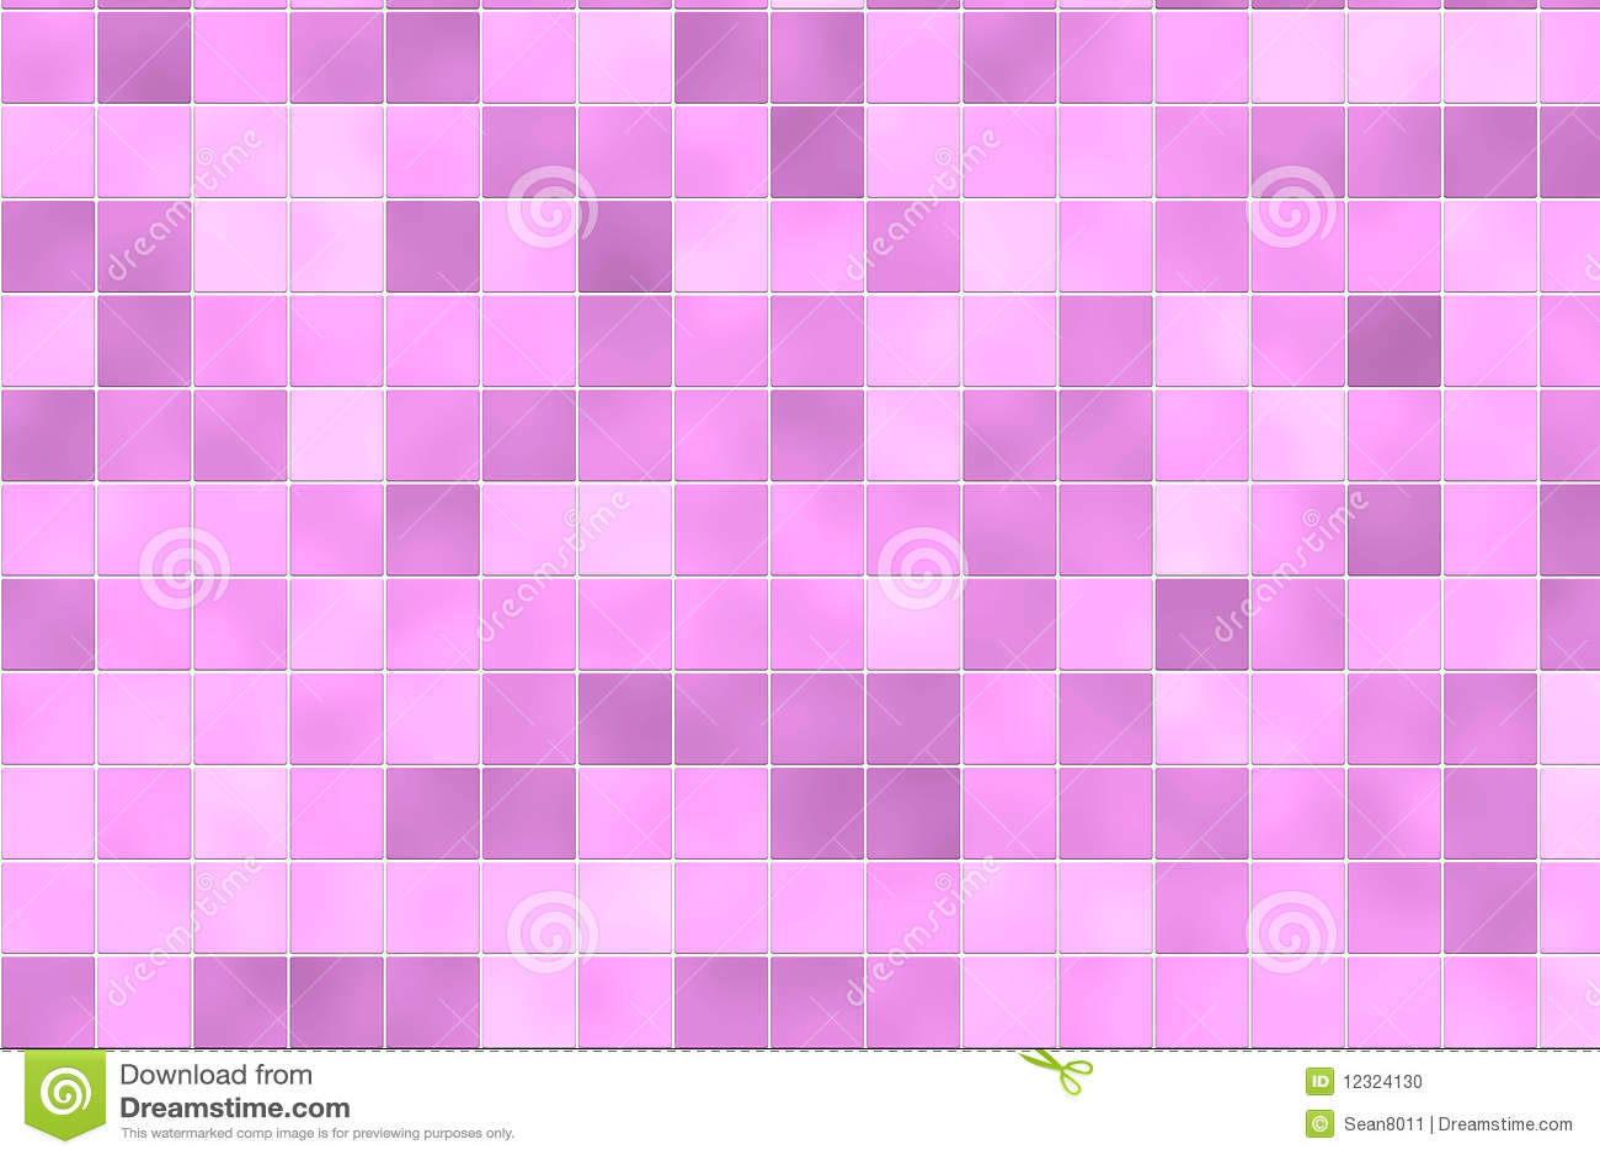 Random Pink Bathroom Tiles Stock Photo Image 12324130